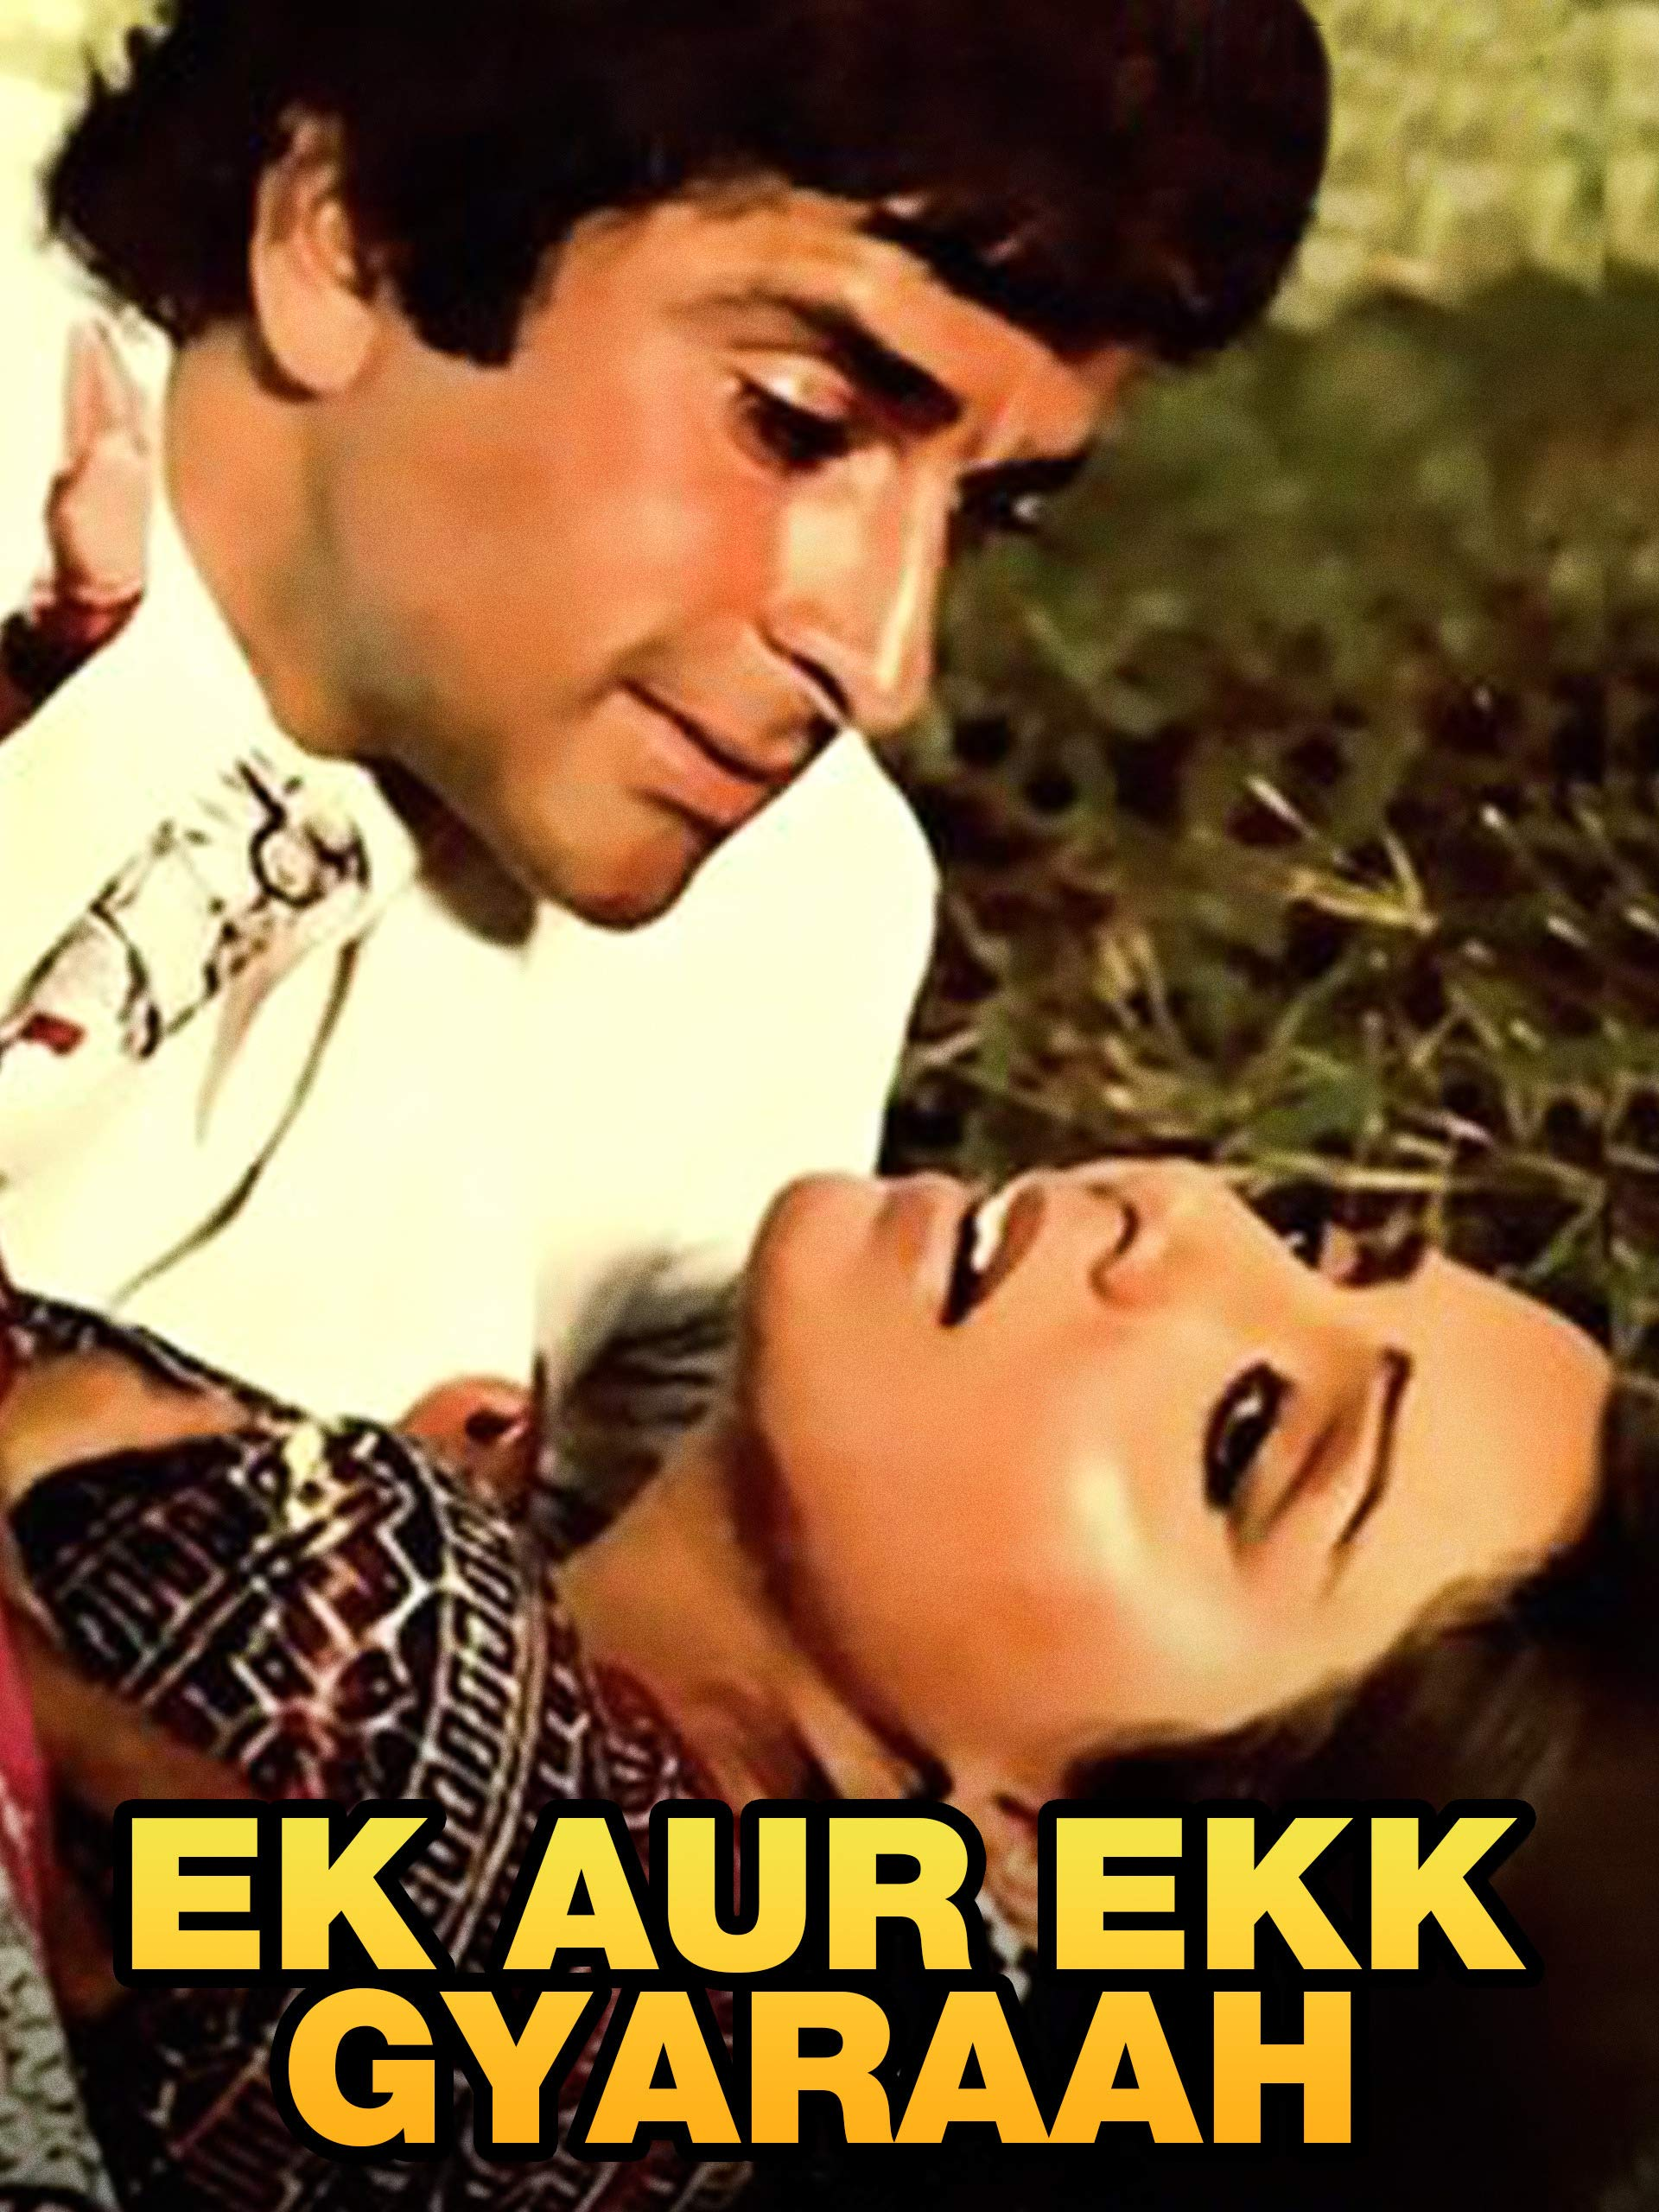 Neetu Singh Movies Tv And Bio